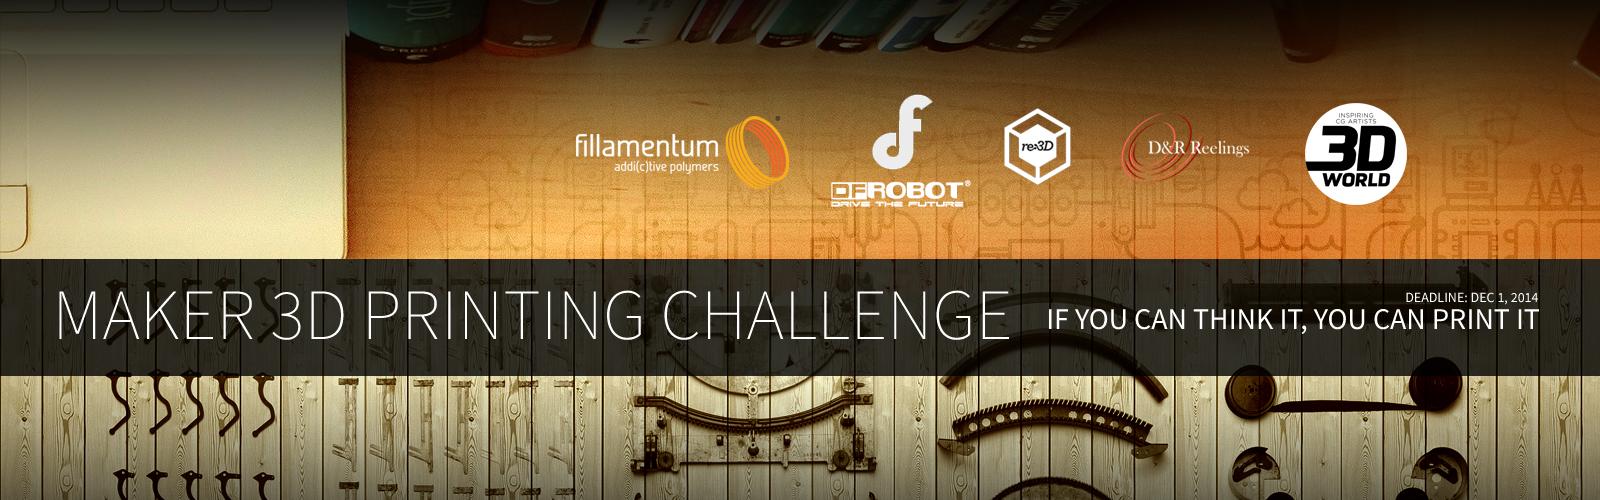 Maker 3D Printing Challenge